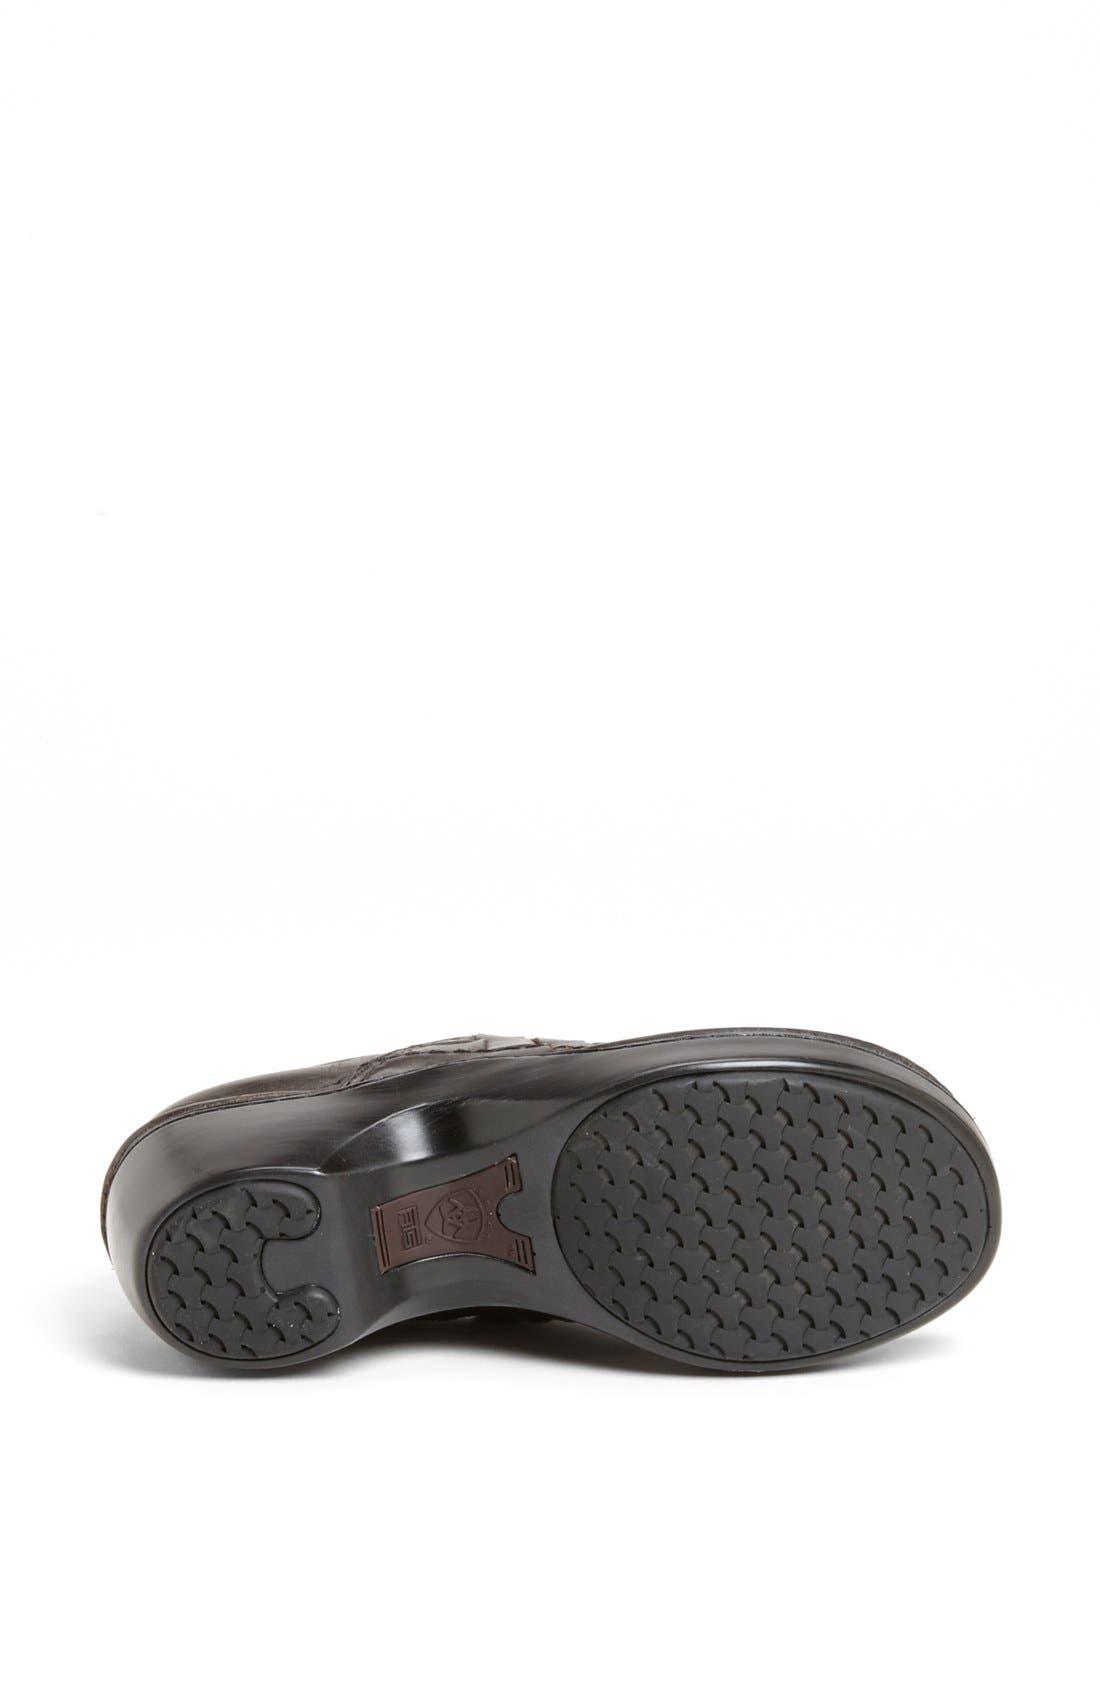 Alternate Image 4  - Ariat 'Ashbourne' Woven Leather Clog